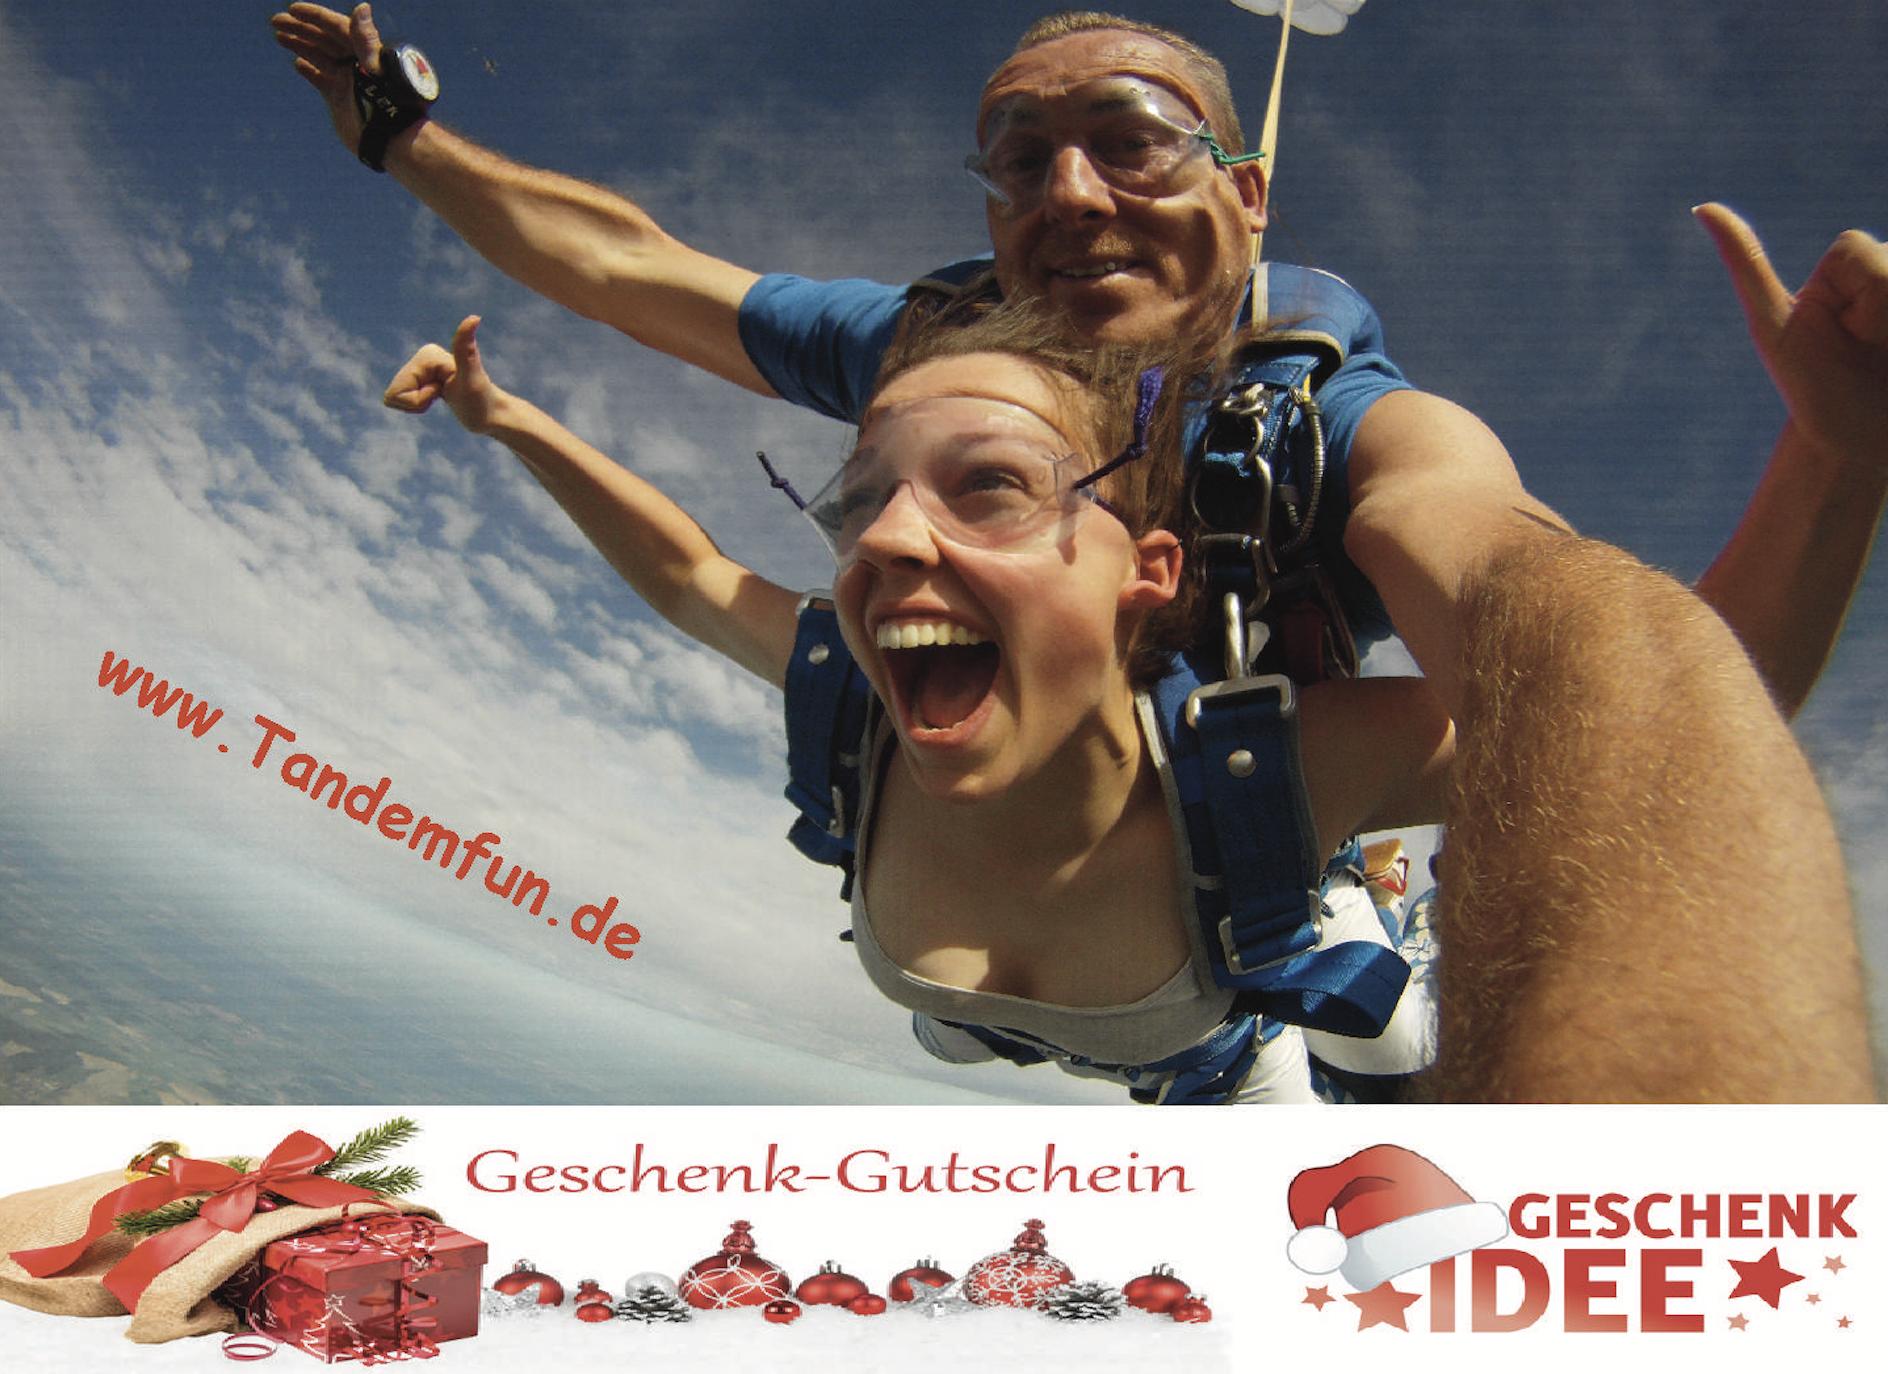 Geschenkidee-Tandemsprung